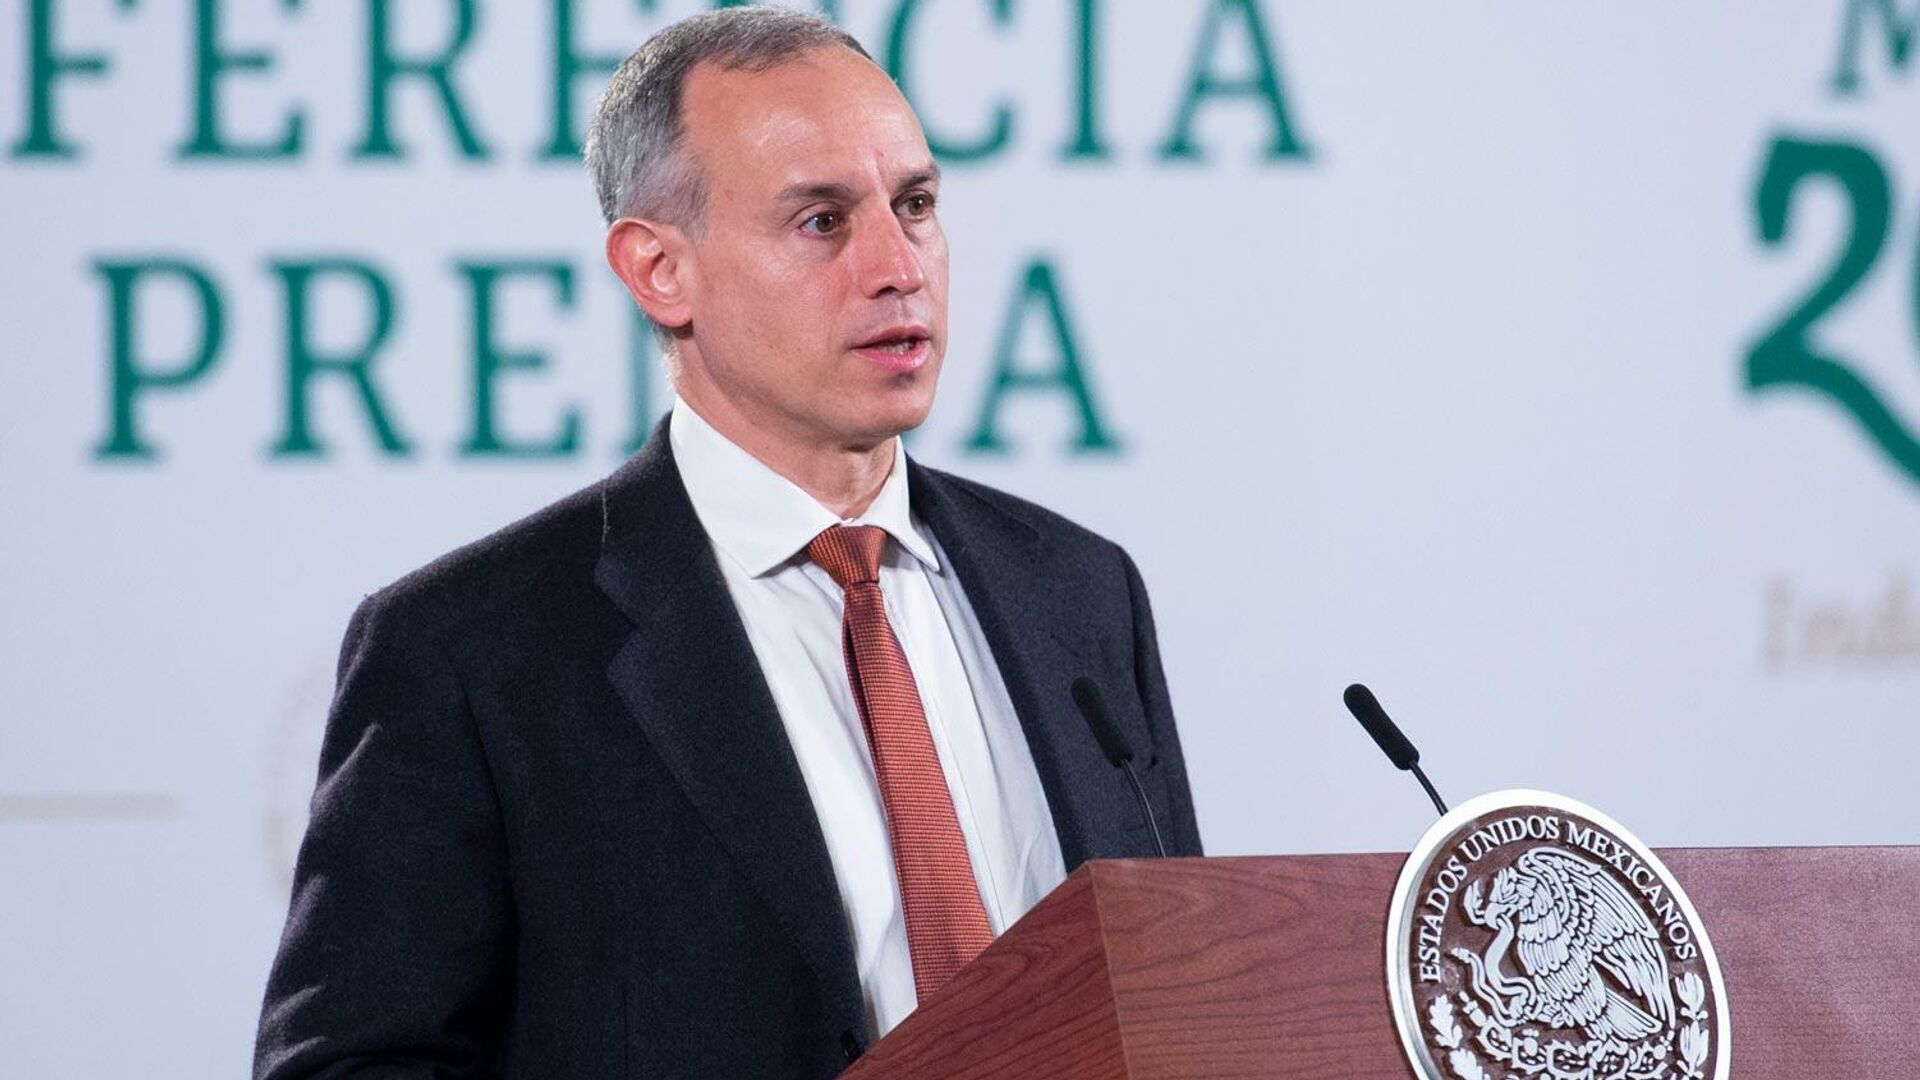 Hugo López-Gatell, subsecretario de la Secretaría de la Salud México - Sputnik Mundo, 1920, 21.09.2021